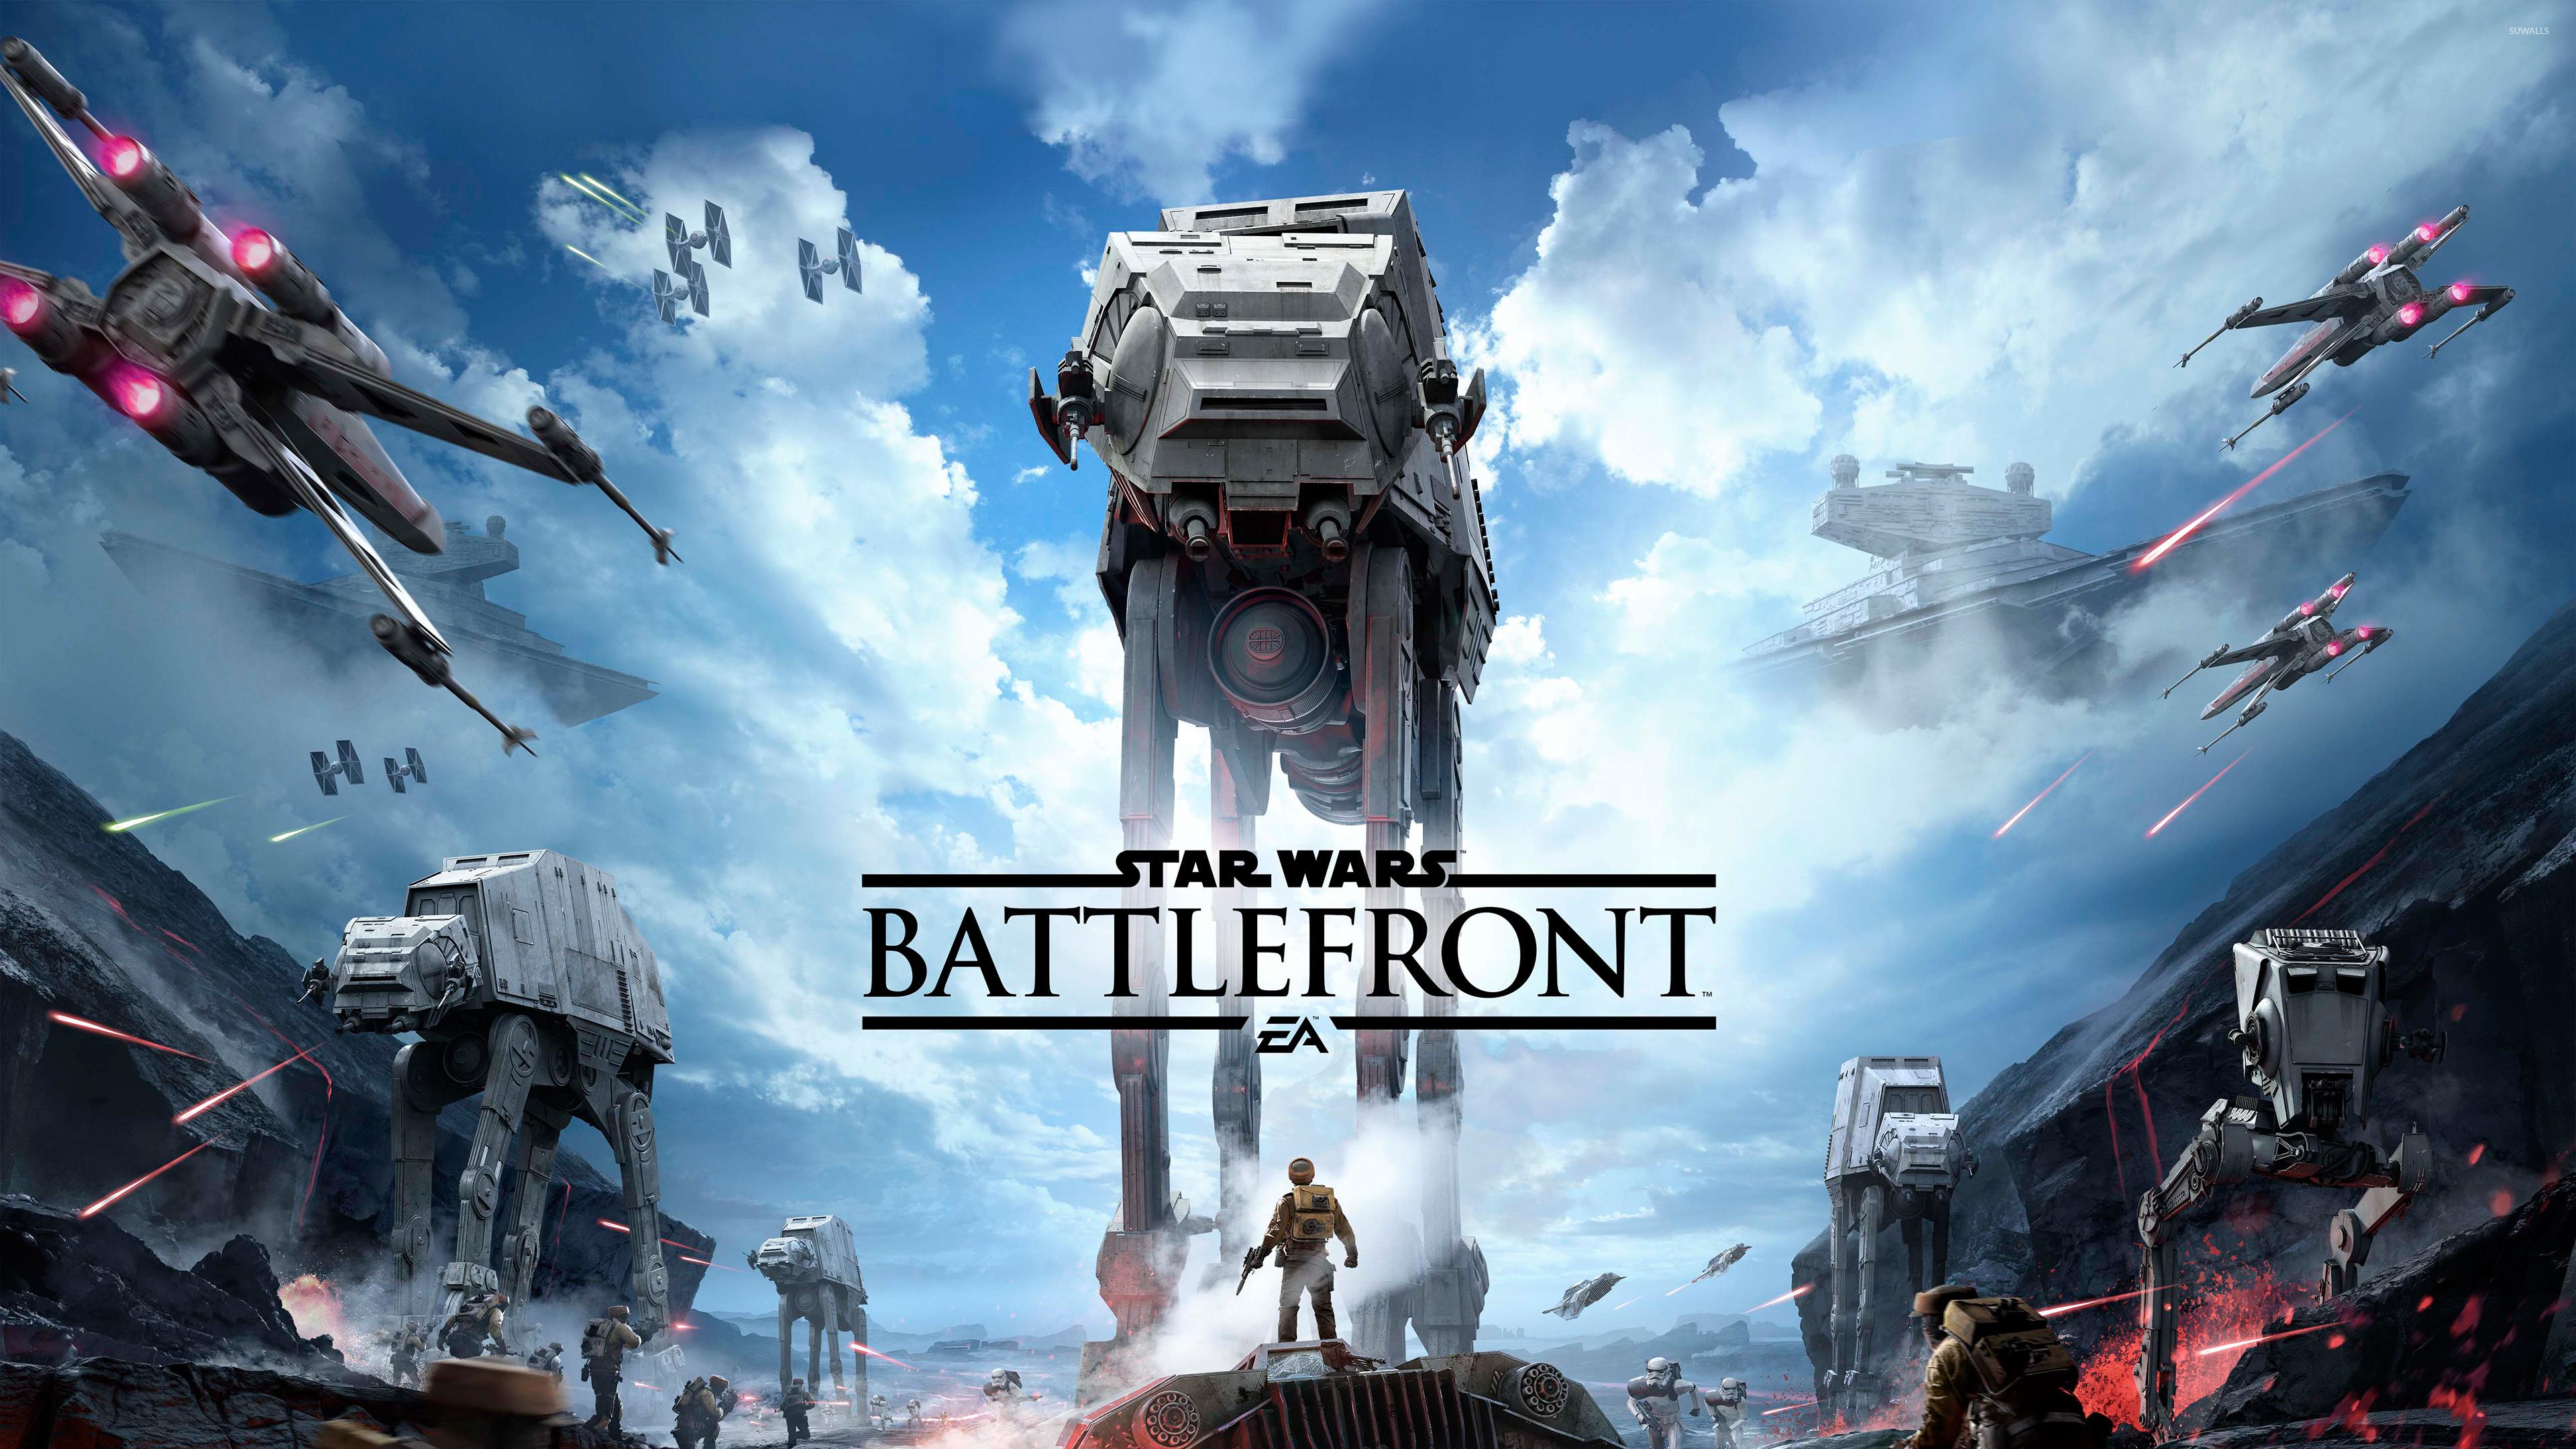 Star Wars Battlefront Wallpaper Game Wallpapers 49404